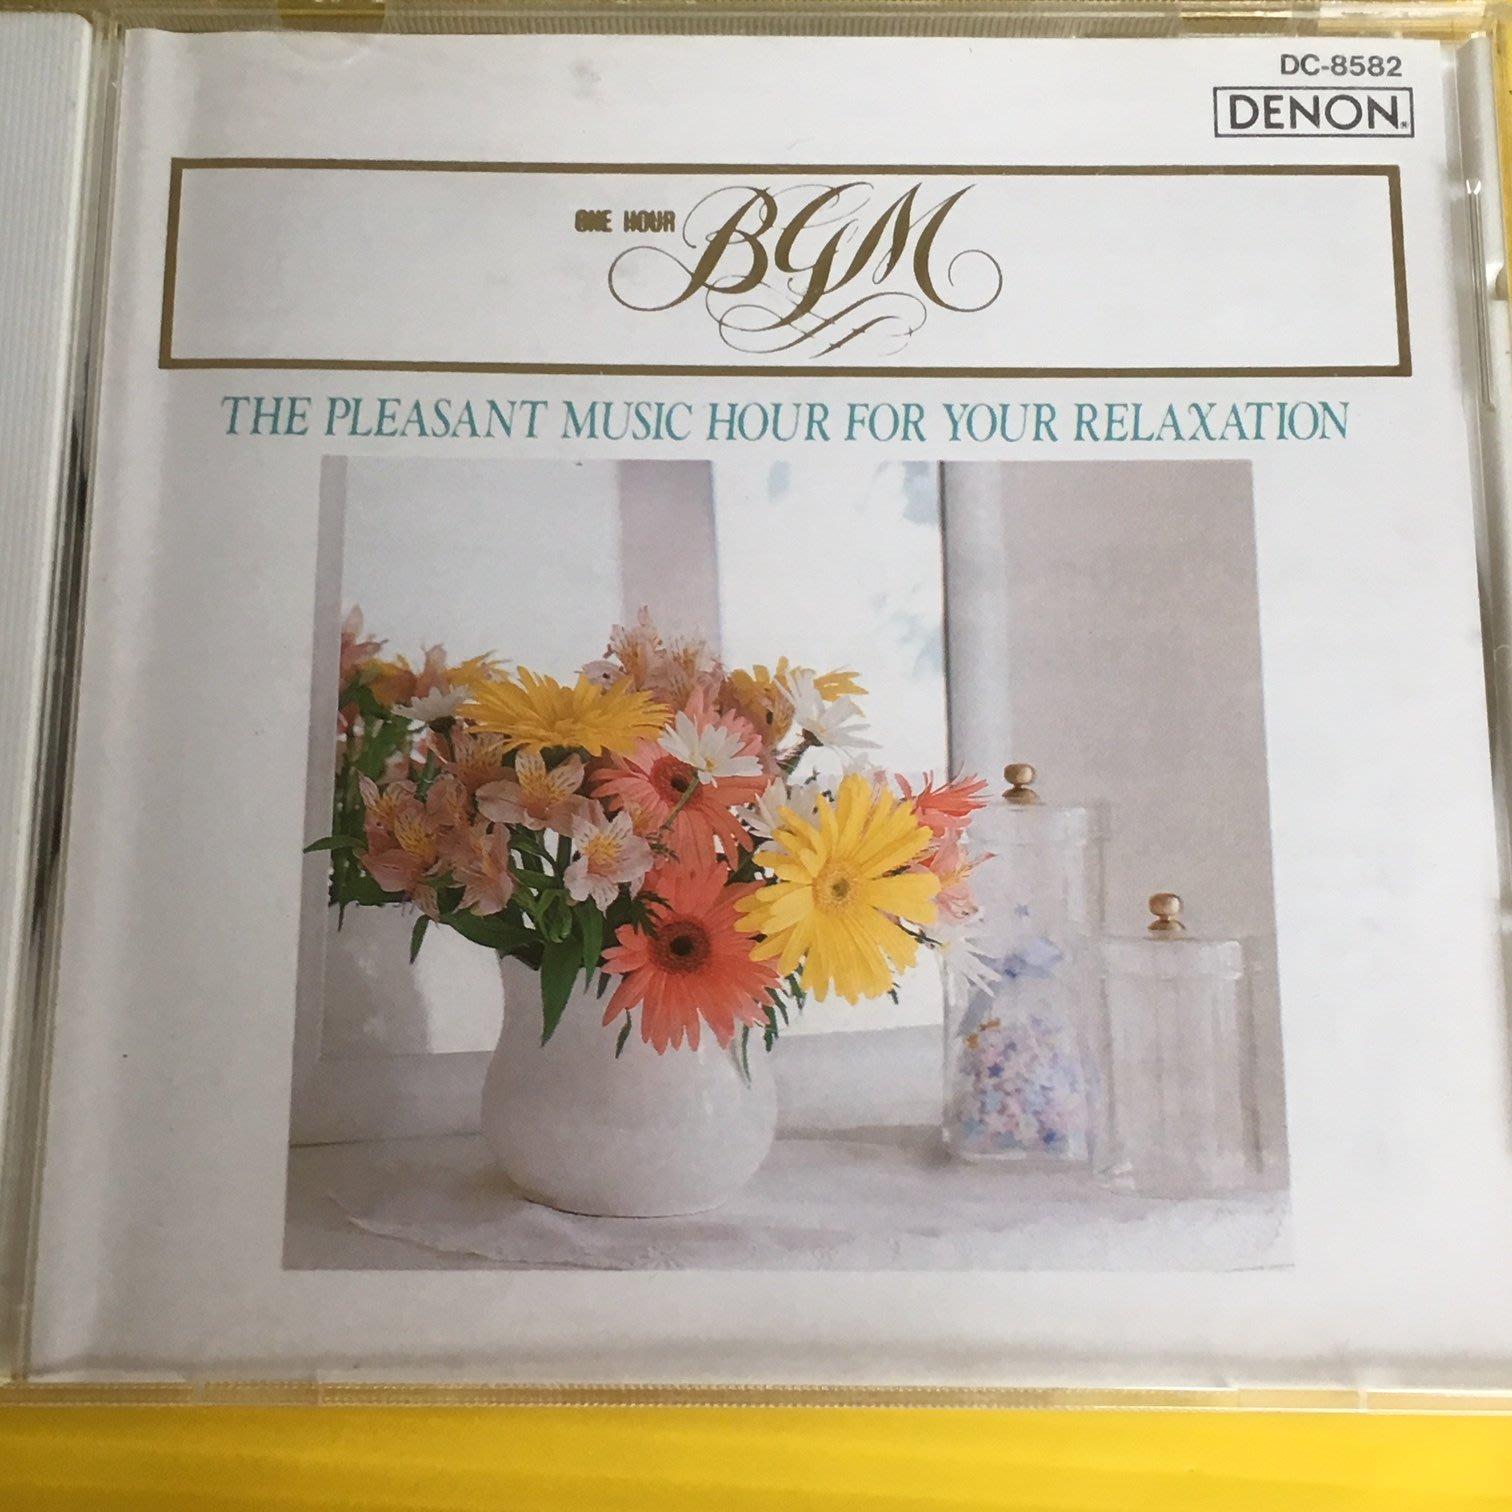 *愛樂熊貓*BGM西洋情歌管弦演奏The pleasant music hour90DENON日本版(無IFPI)絕版